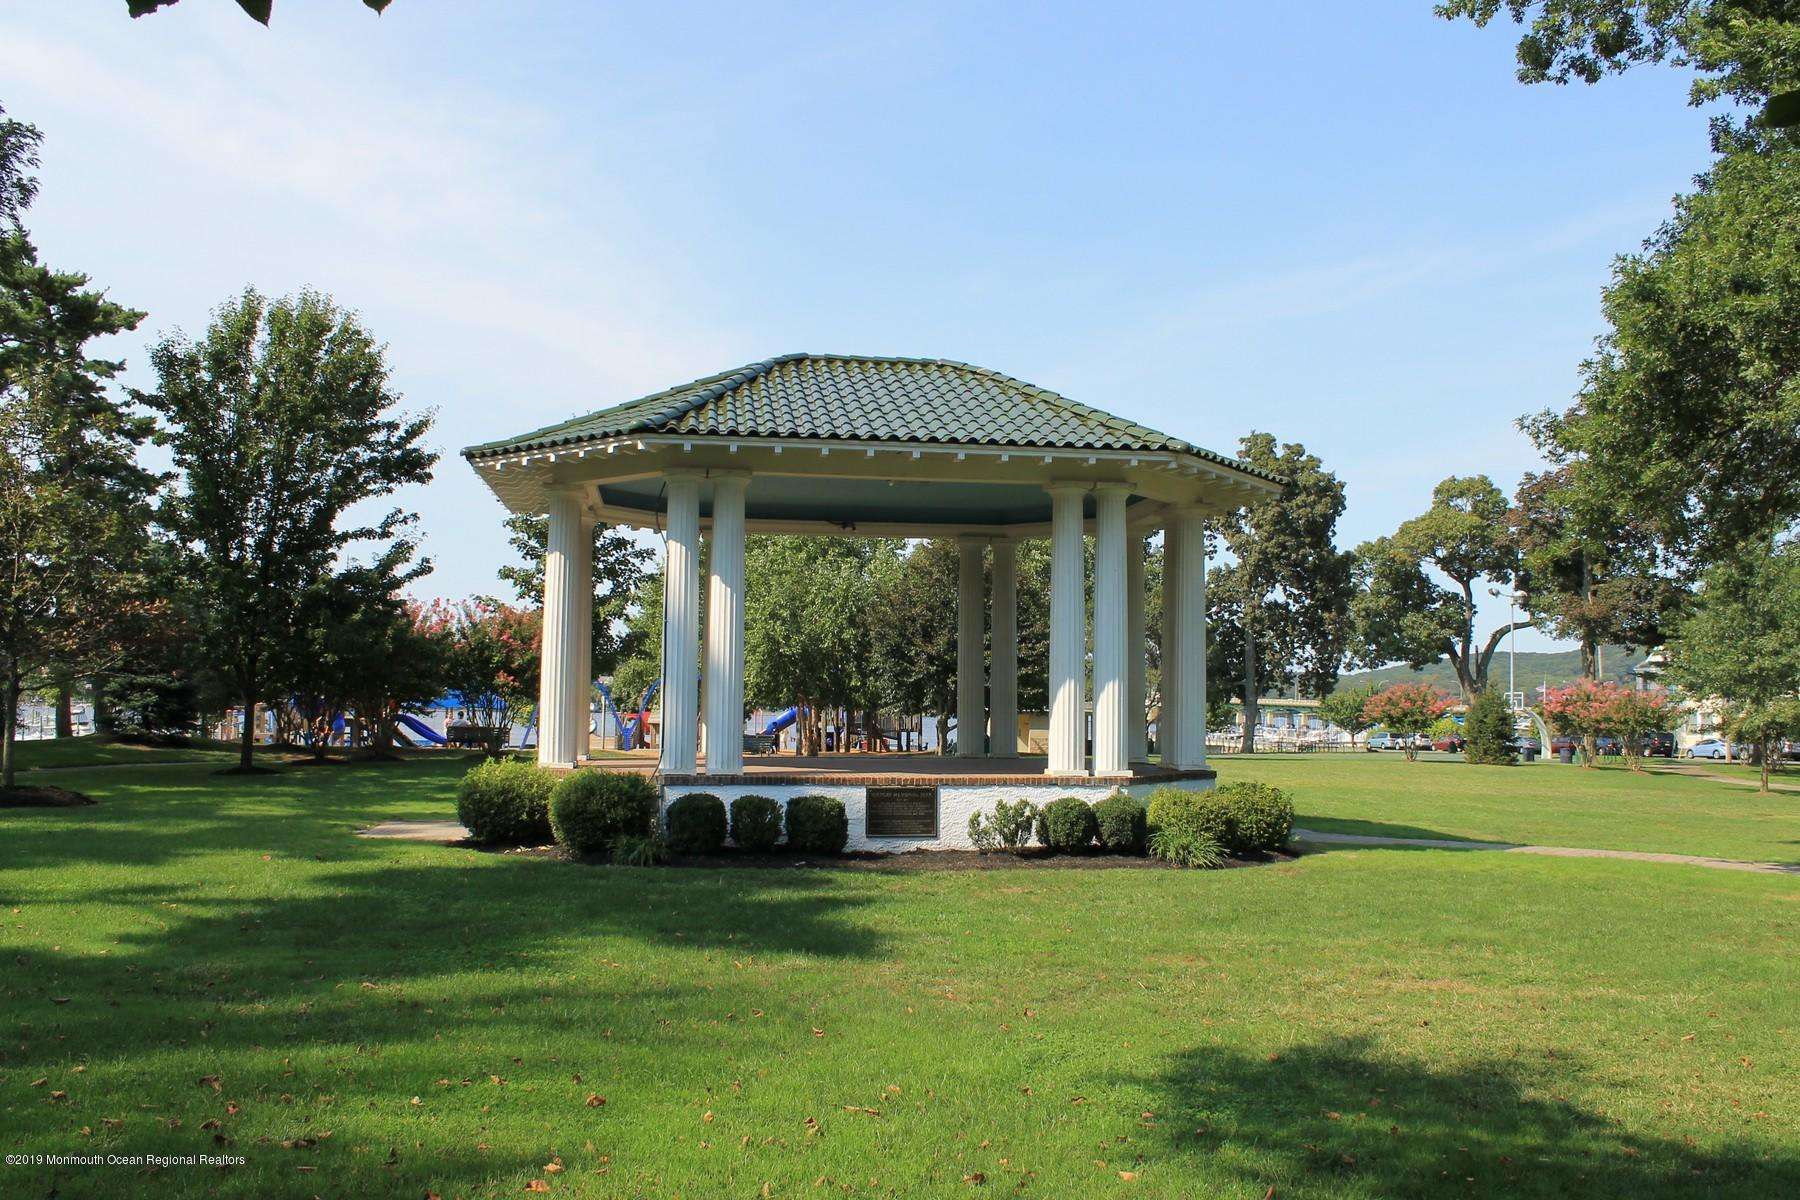 Victory Park in Rumson